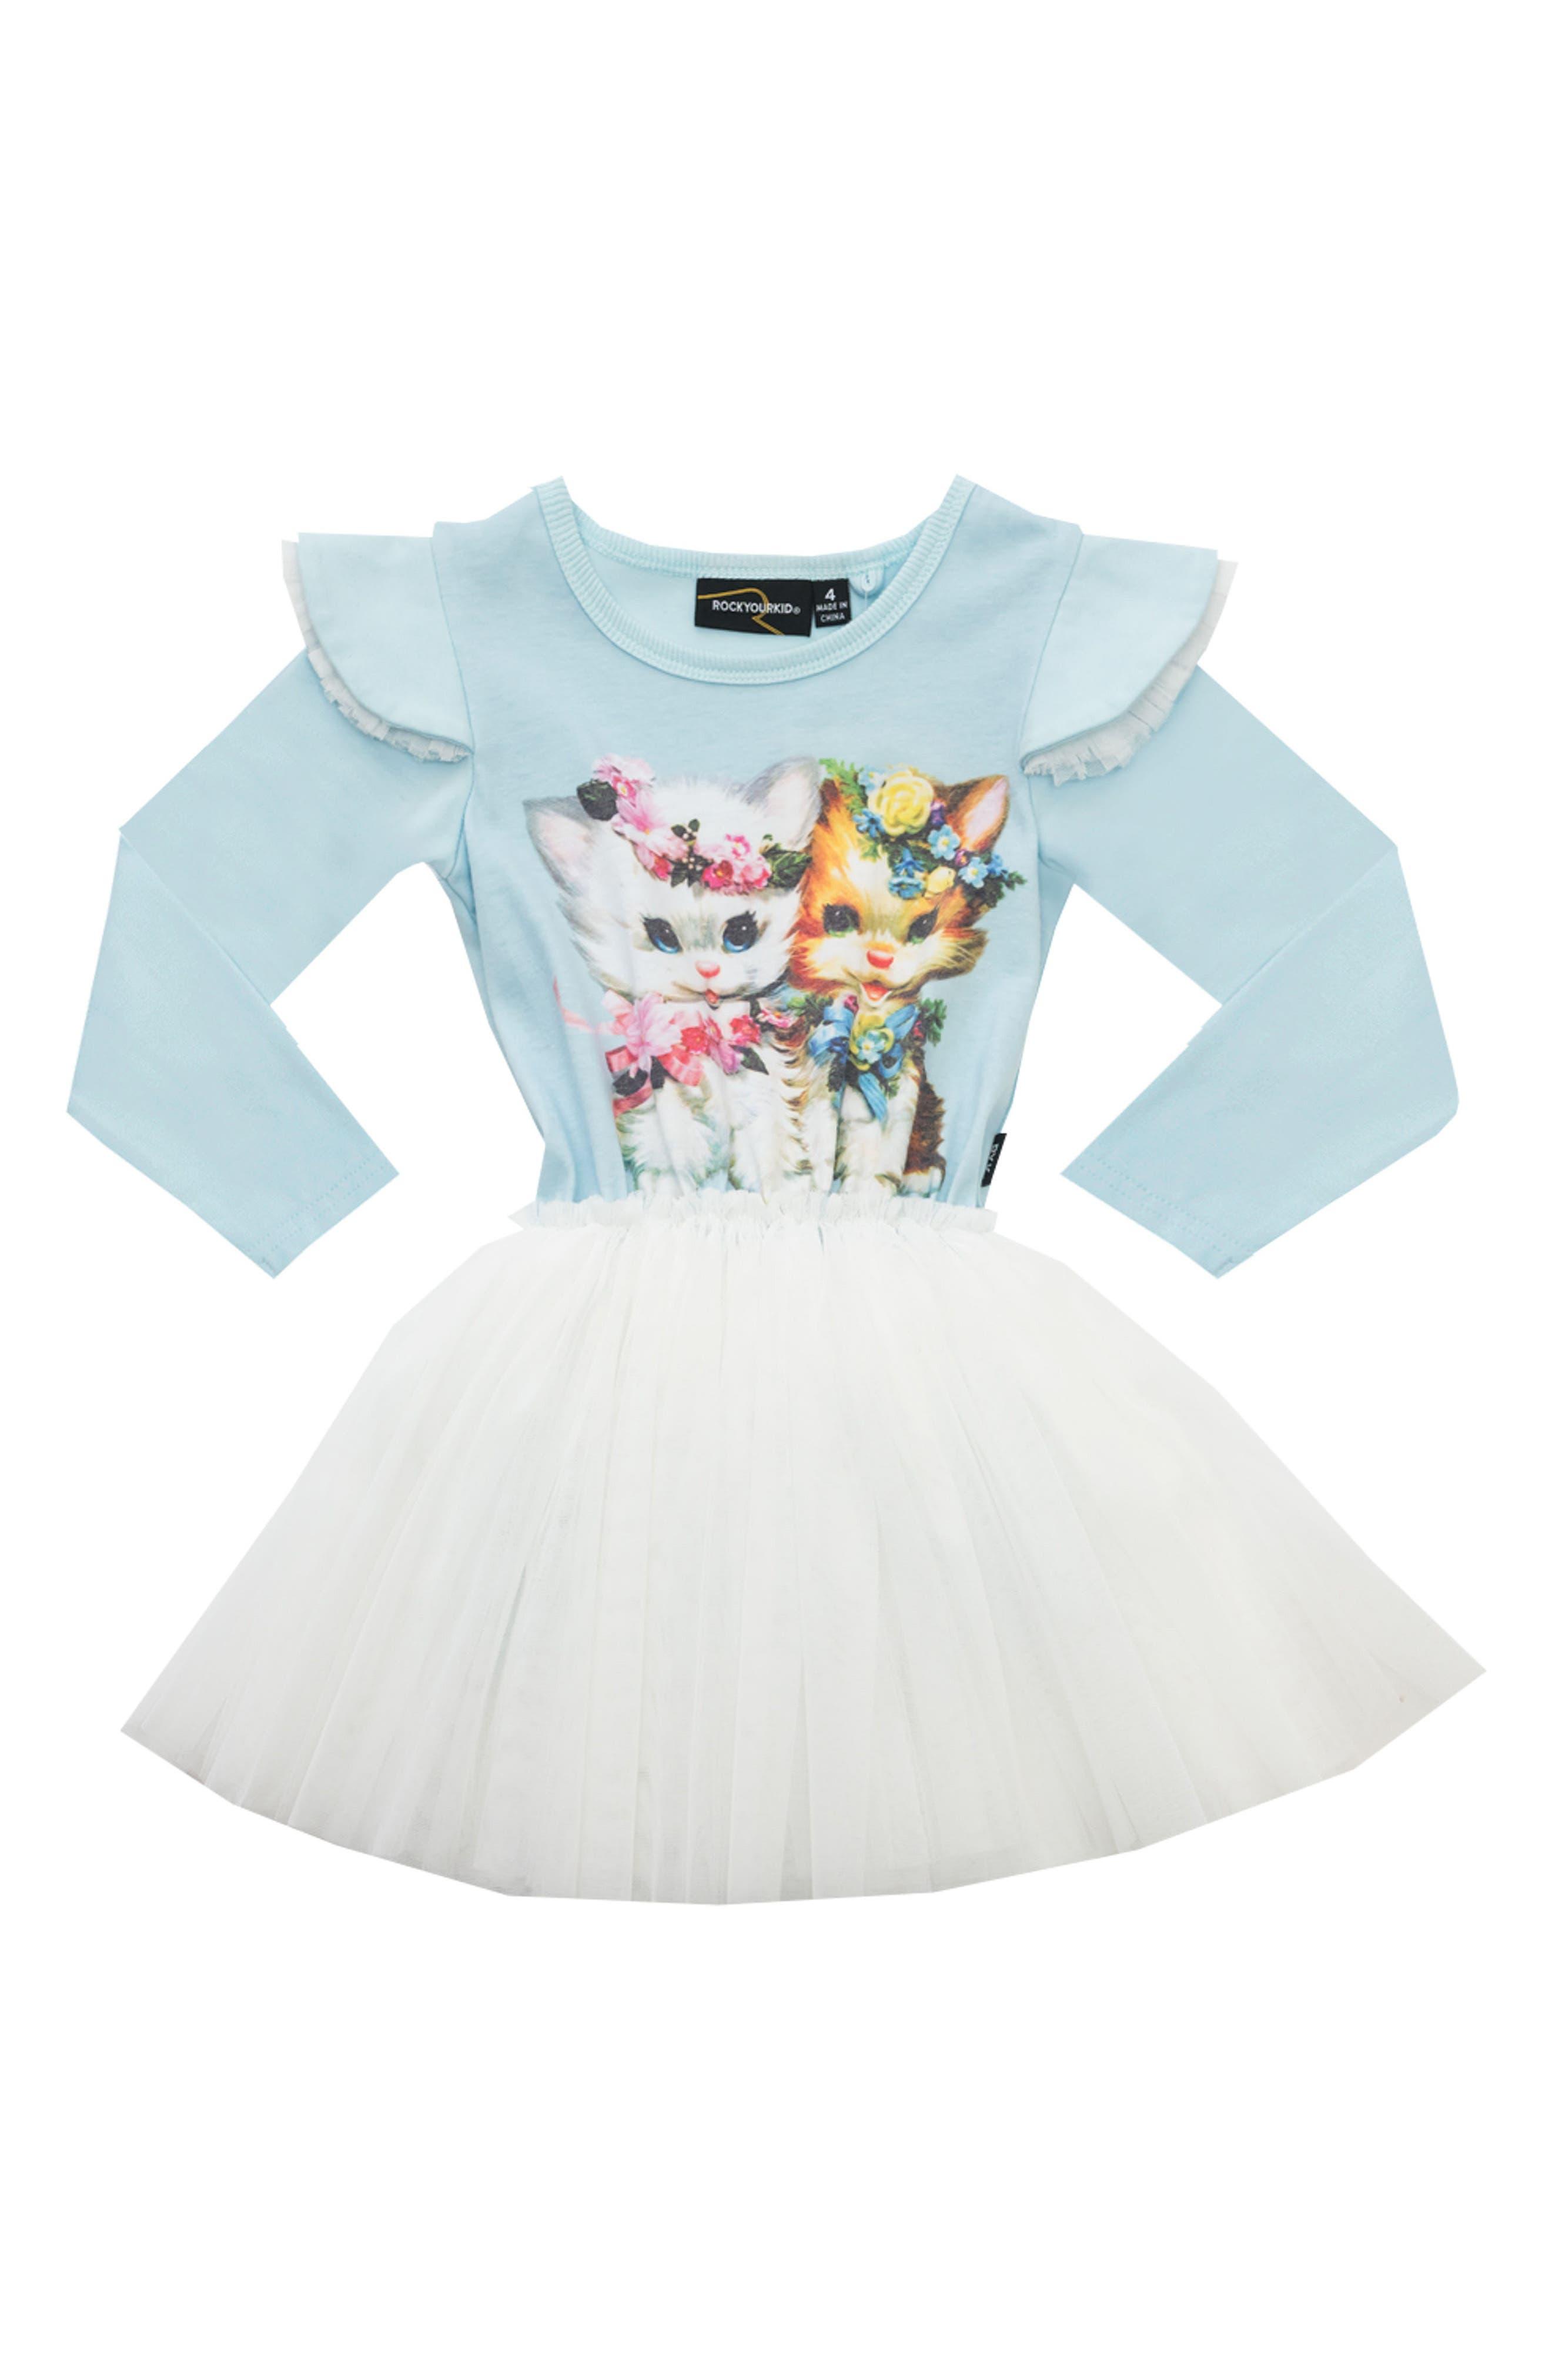 Rock Your Kid Lulu & Lola Circus Dress (Toddler Girls & Little Girls)